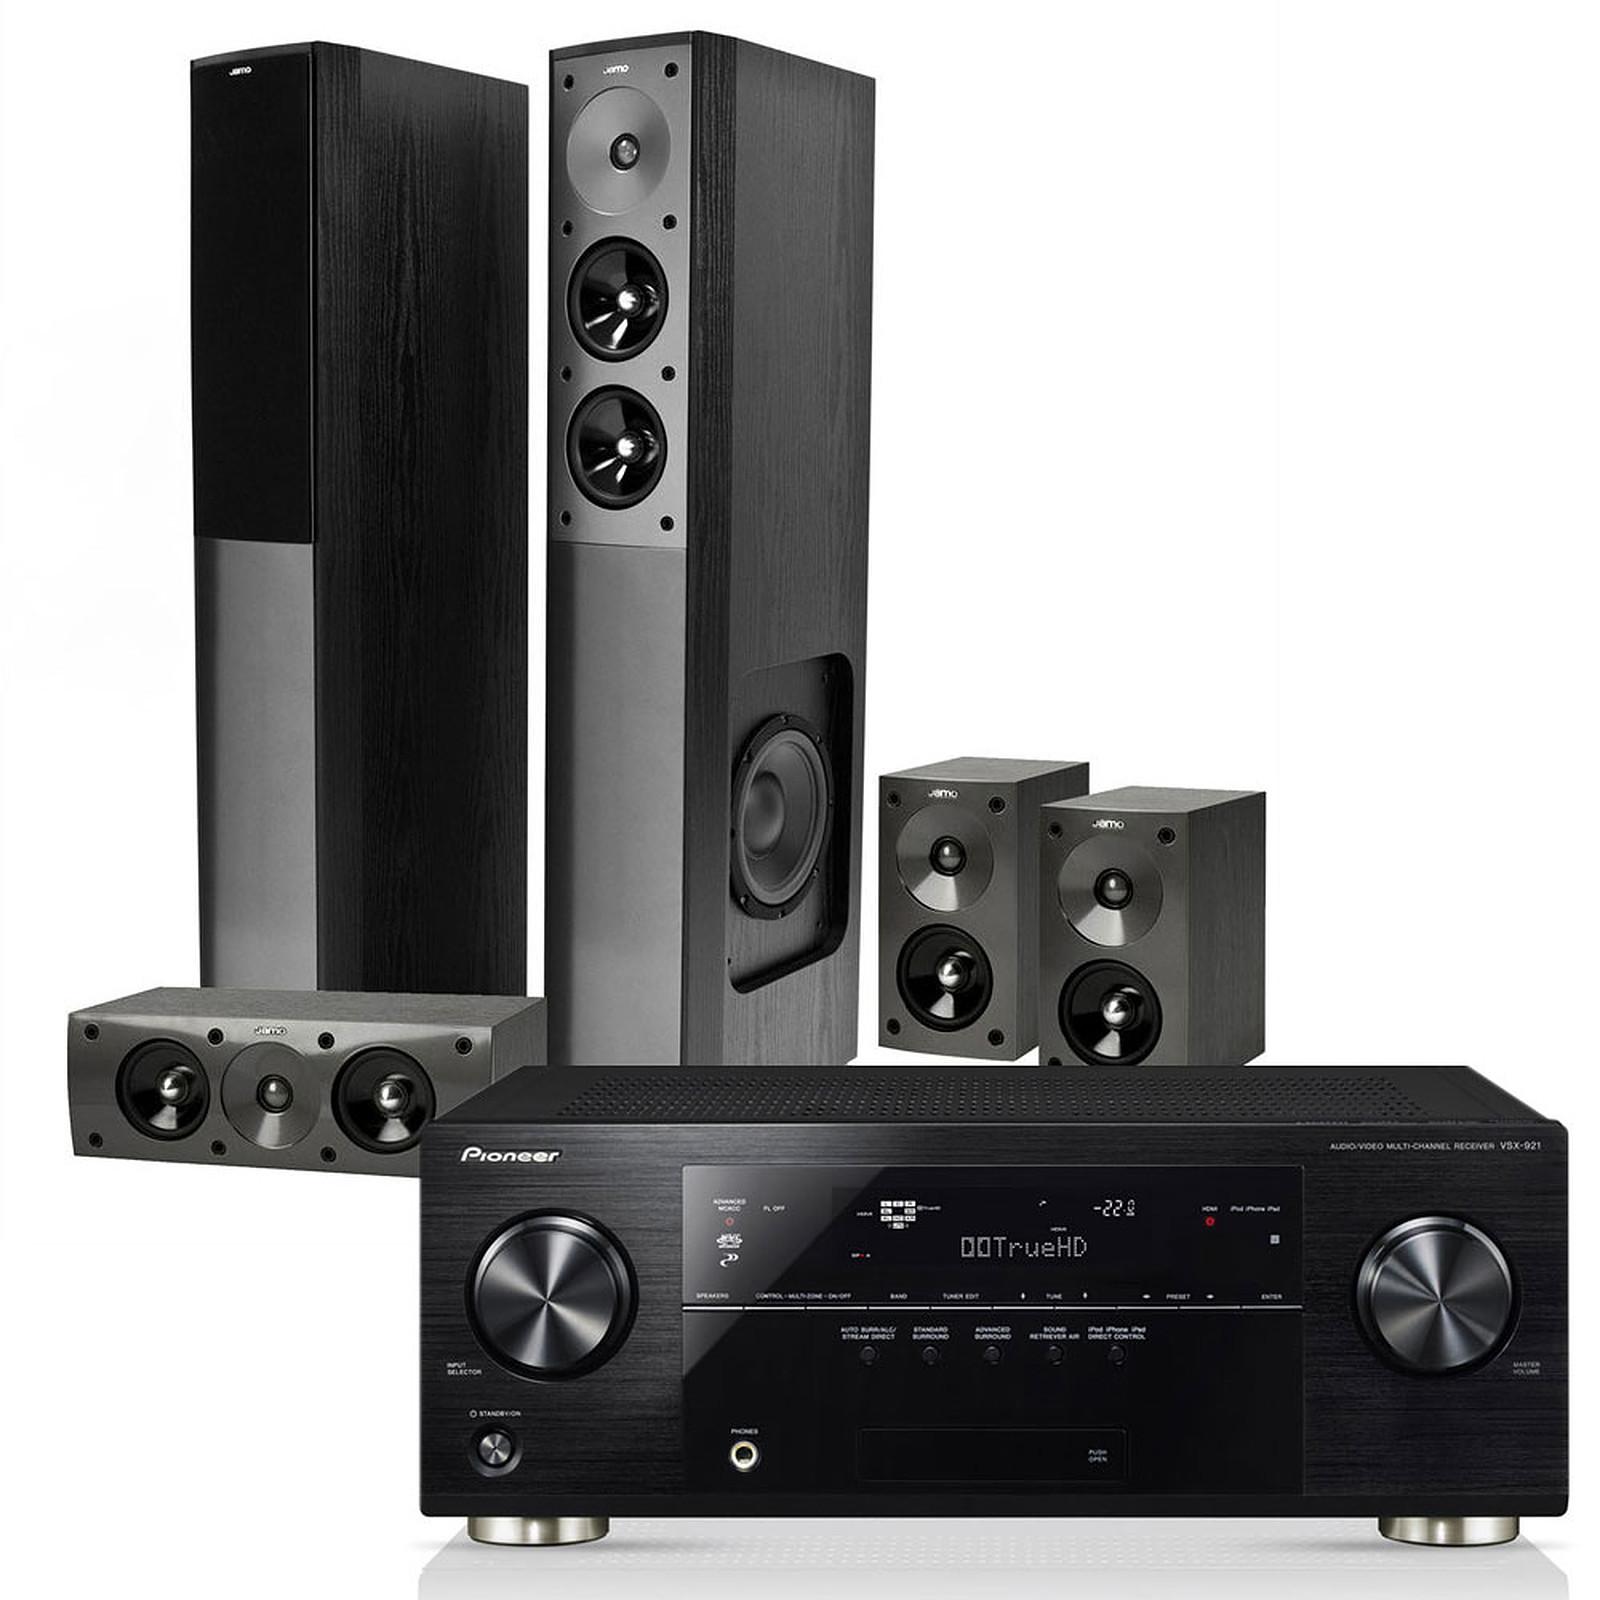 Pioneer VSX-921 Noir + Jamo S 606 HCS 3 Black Gloss